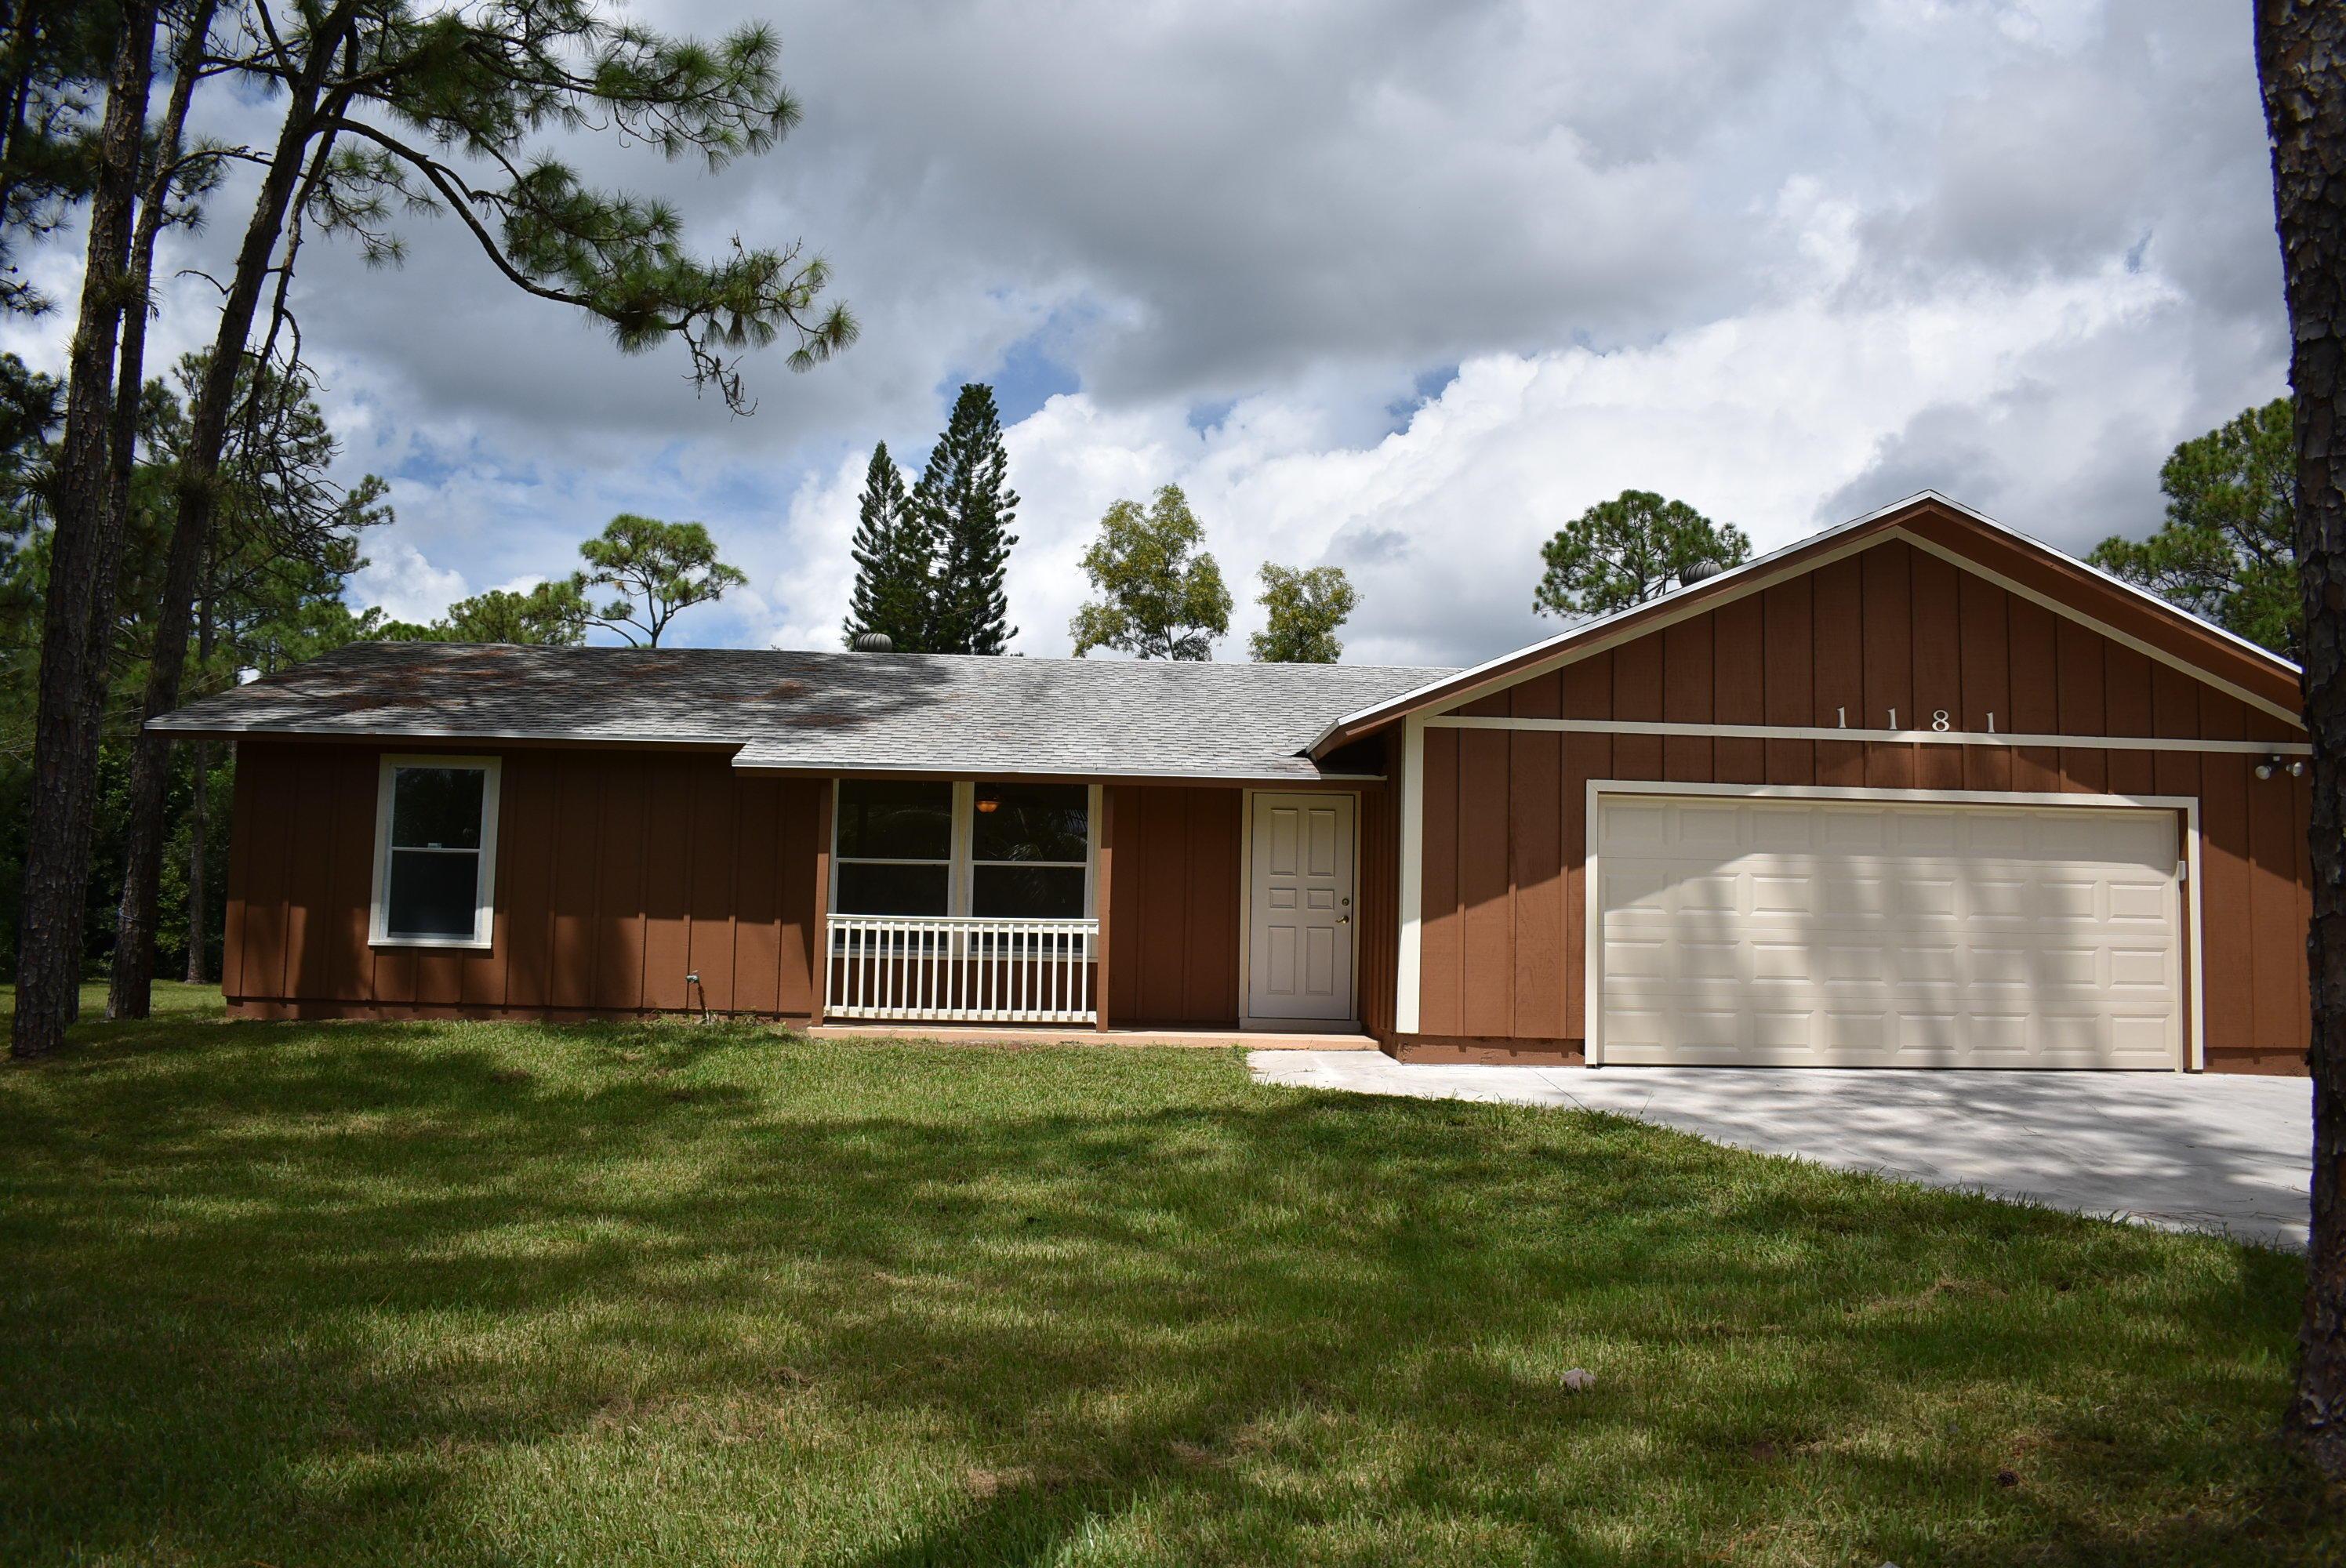 1181 C Road, Loxahatchee Groves, FL 33470